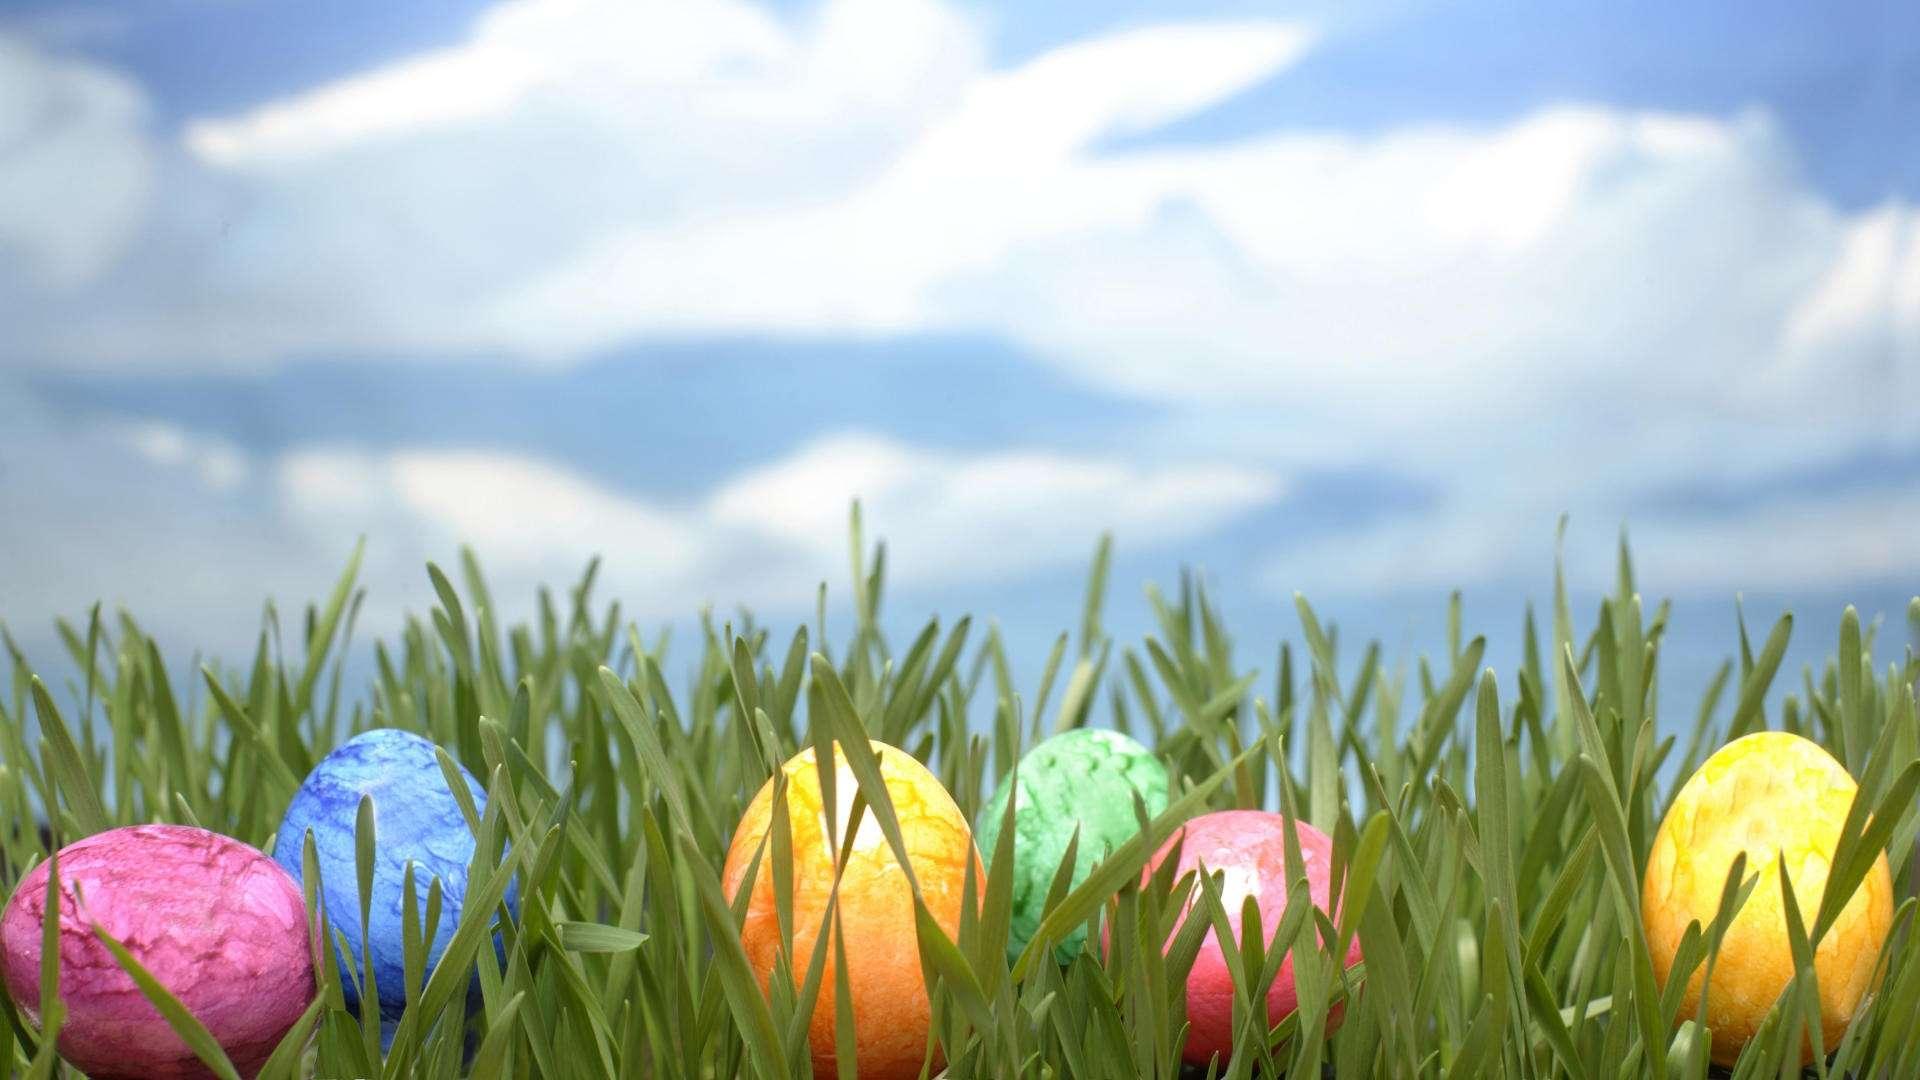 Easter Egg Backgrounds 1920x1080